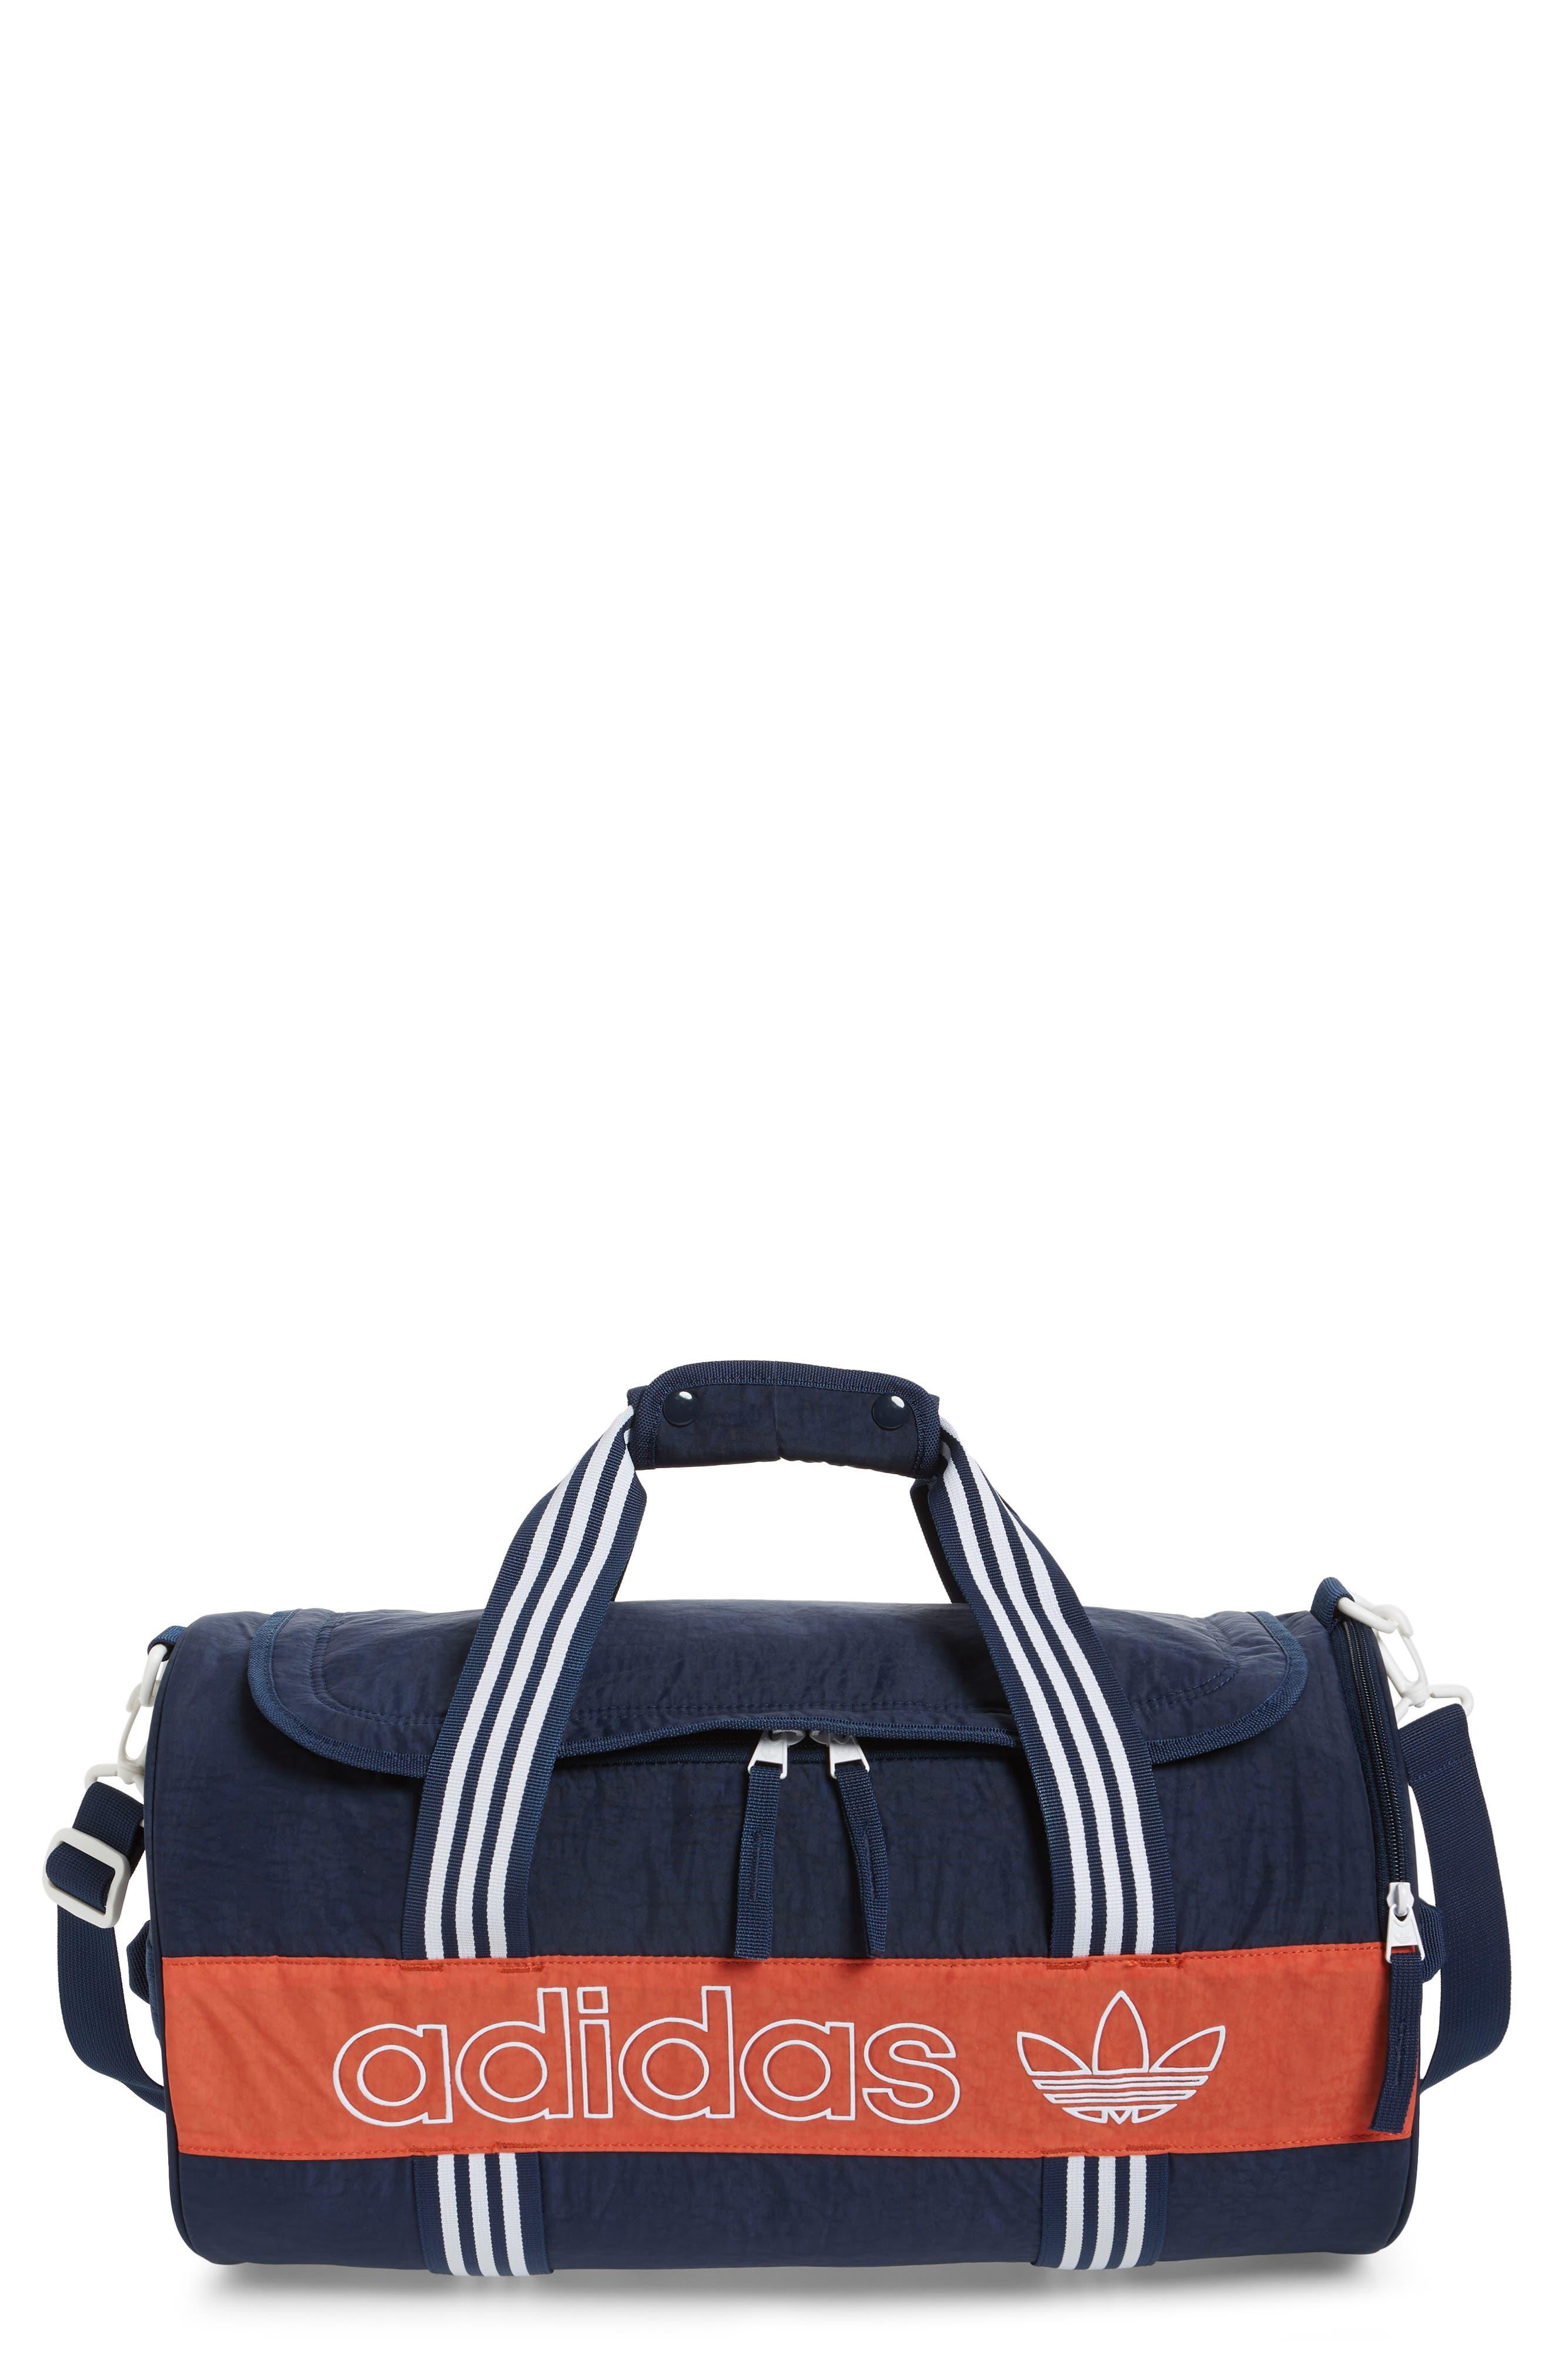 ADIDAS ORIGINALS adidas Spirit Roll Duffle Bag, Main, color, COLLEGIATE NAVY/ AMBER/ WHITE